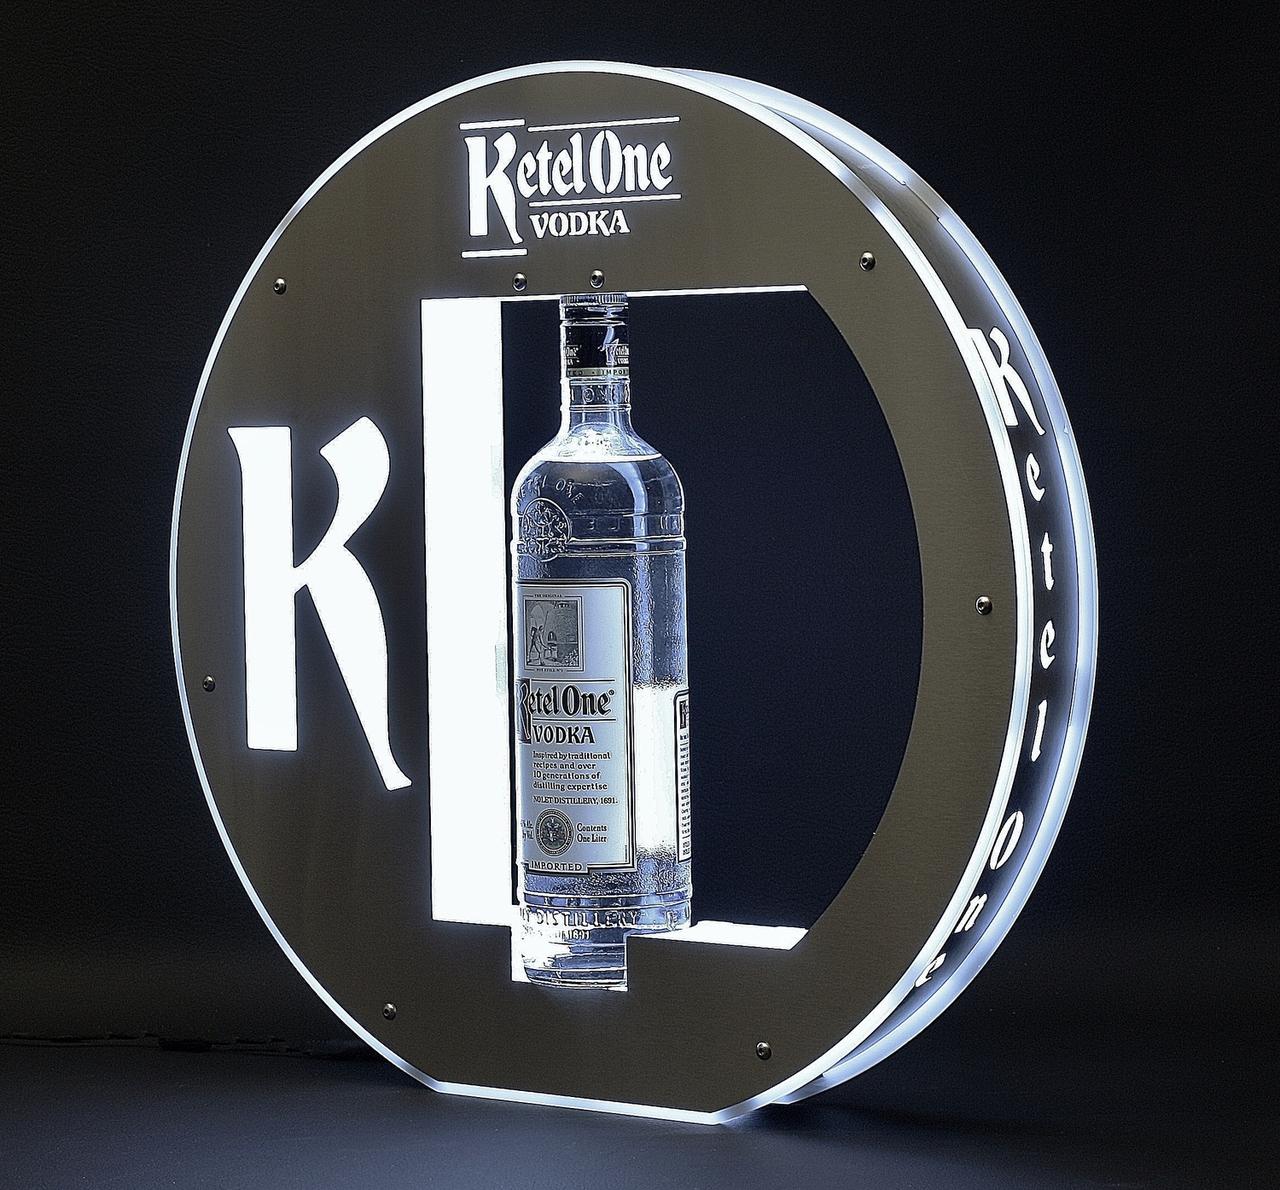 lunar-ketel-one-ciroc-led-bottle-ring-front-patron-bottle-presenter-bottle-service-vip-service-bottle-glorifier-nightclub-nightclubshop.jpg